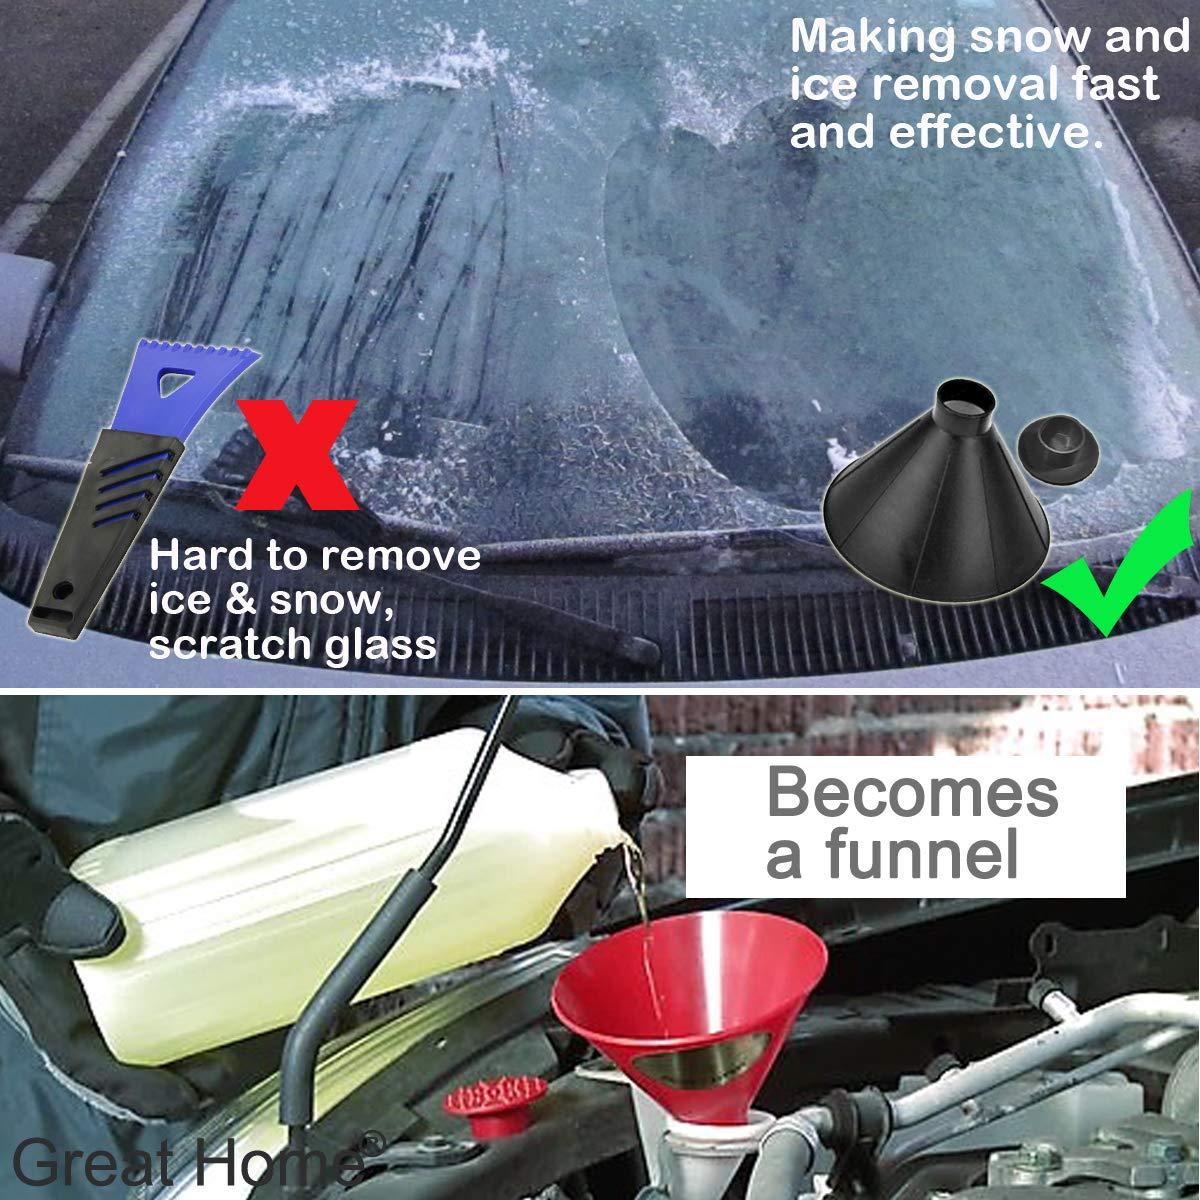 Black Great Home Cone Scrape A Round Ice Scraper Funnel Car Windshield Snow Scraper Cone Shaped Magic Ice Scrapers Shipping by FBA(Spring Week